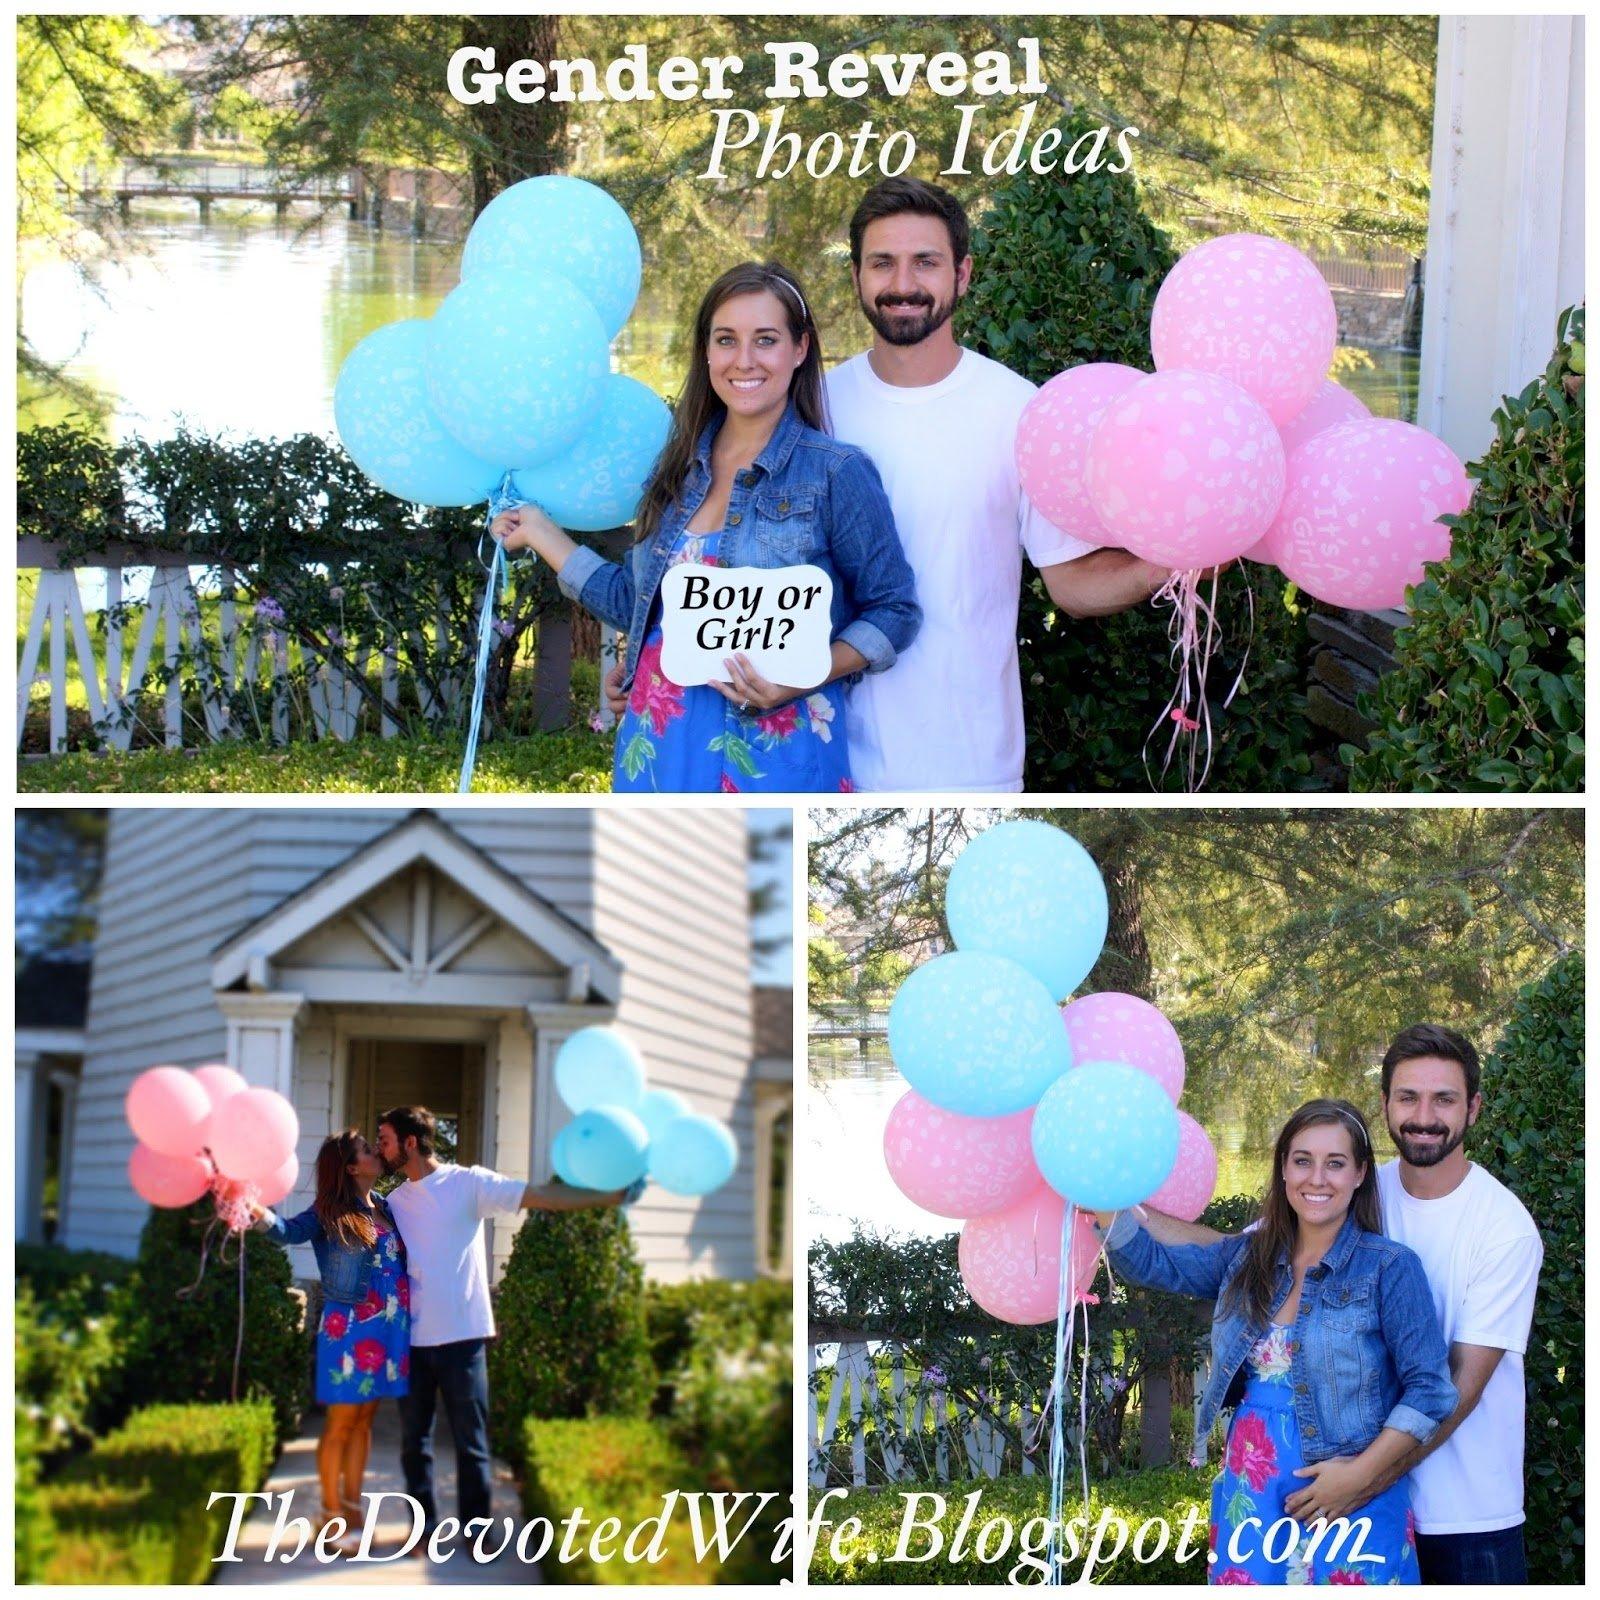 10 Stylish Baby Gender Reveal Photo Ideas eight28 baby gender reveal balloon picture ideas